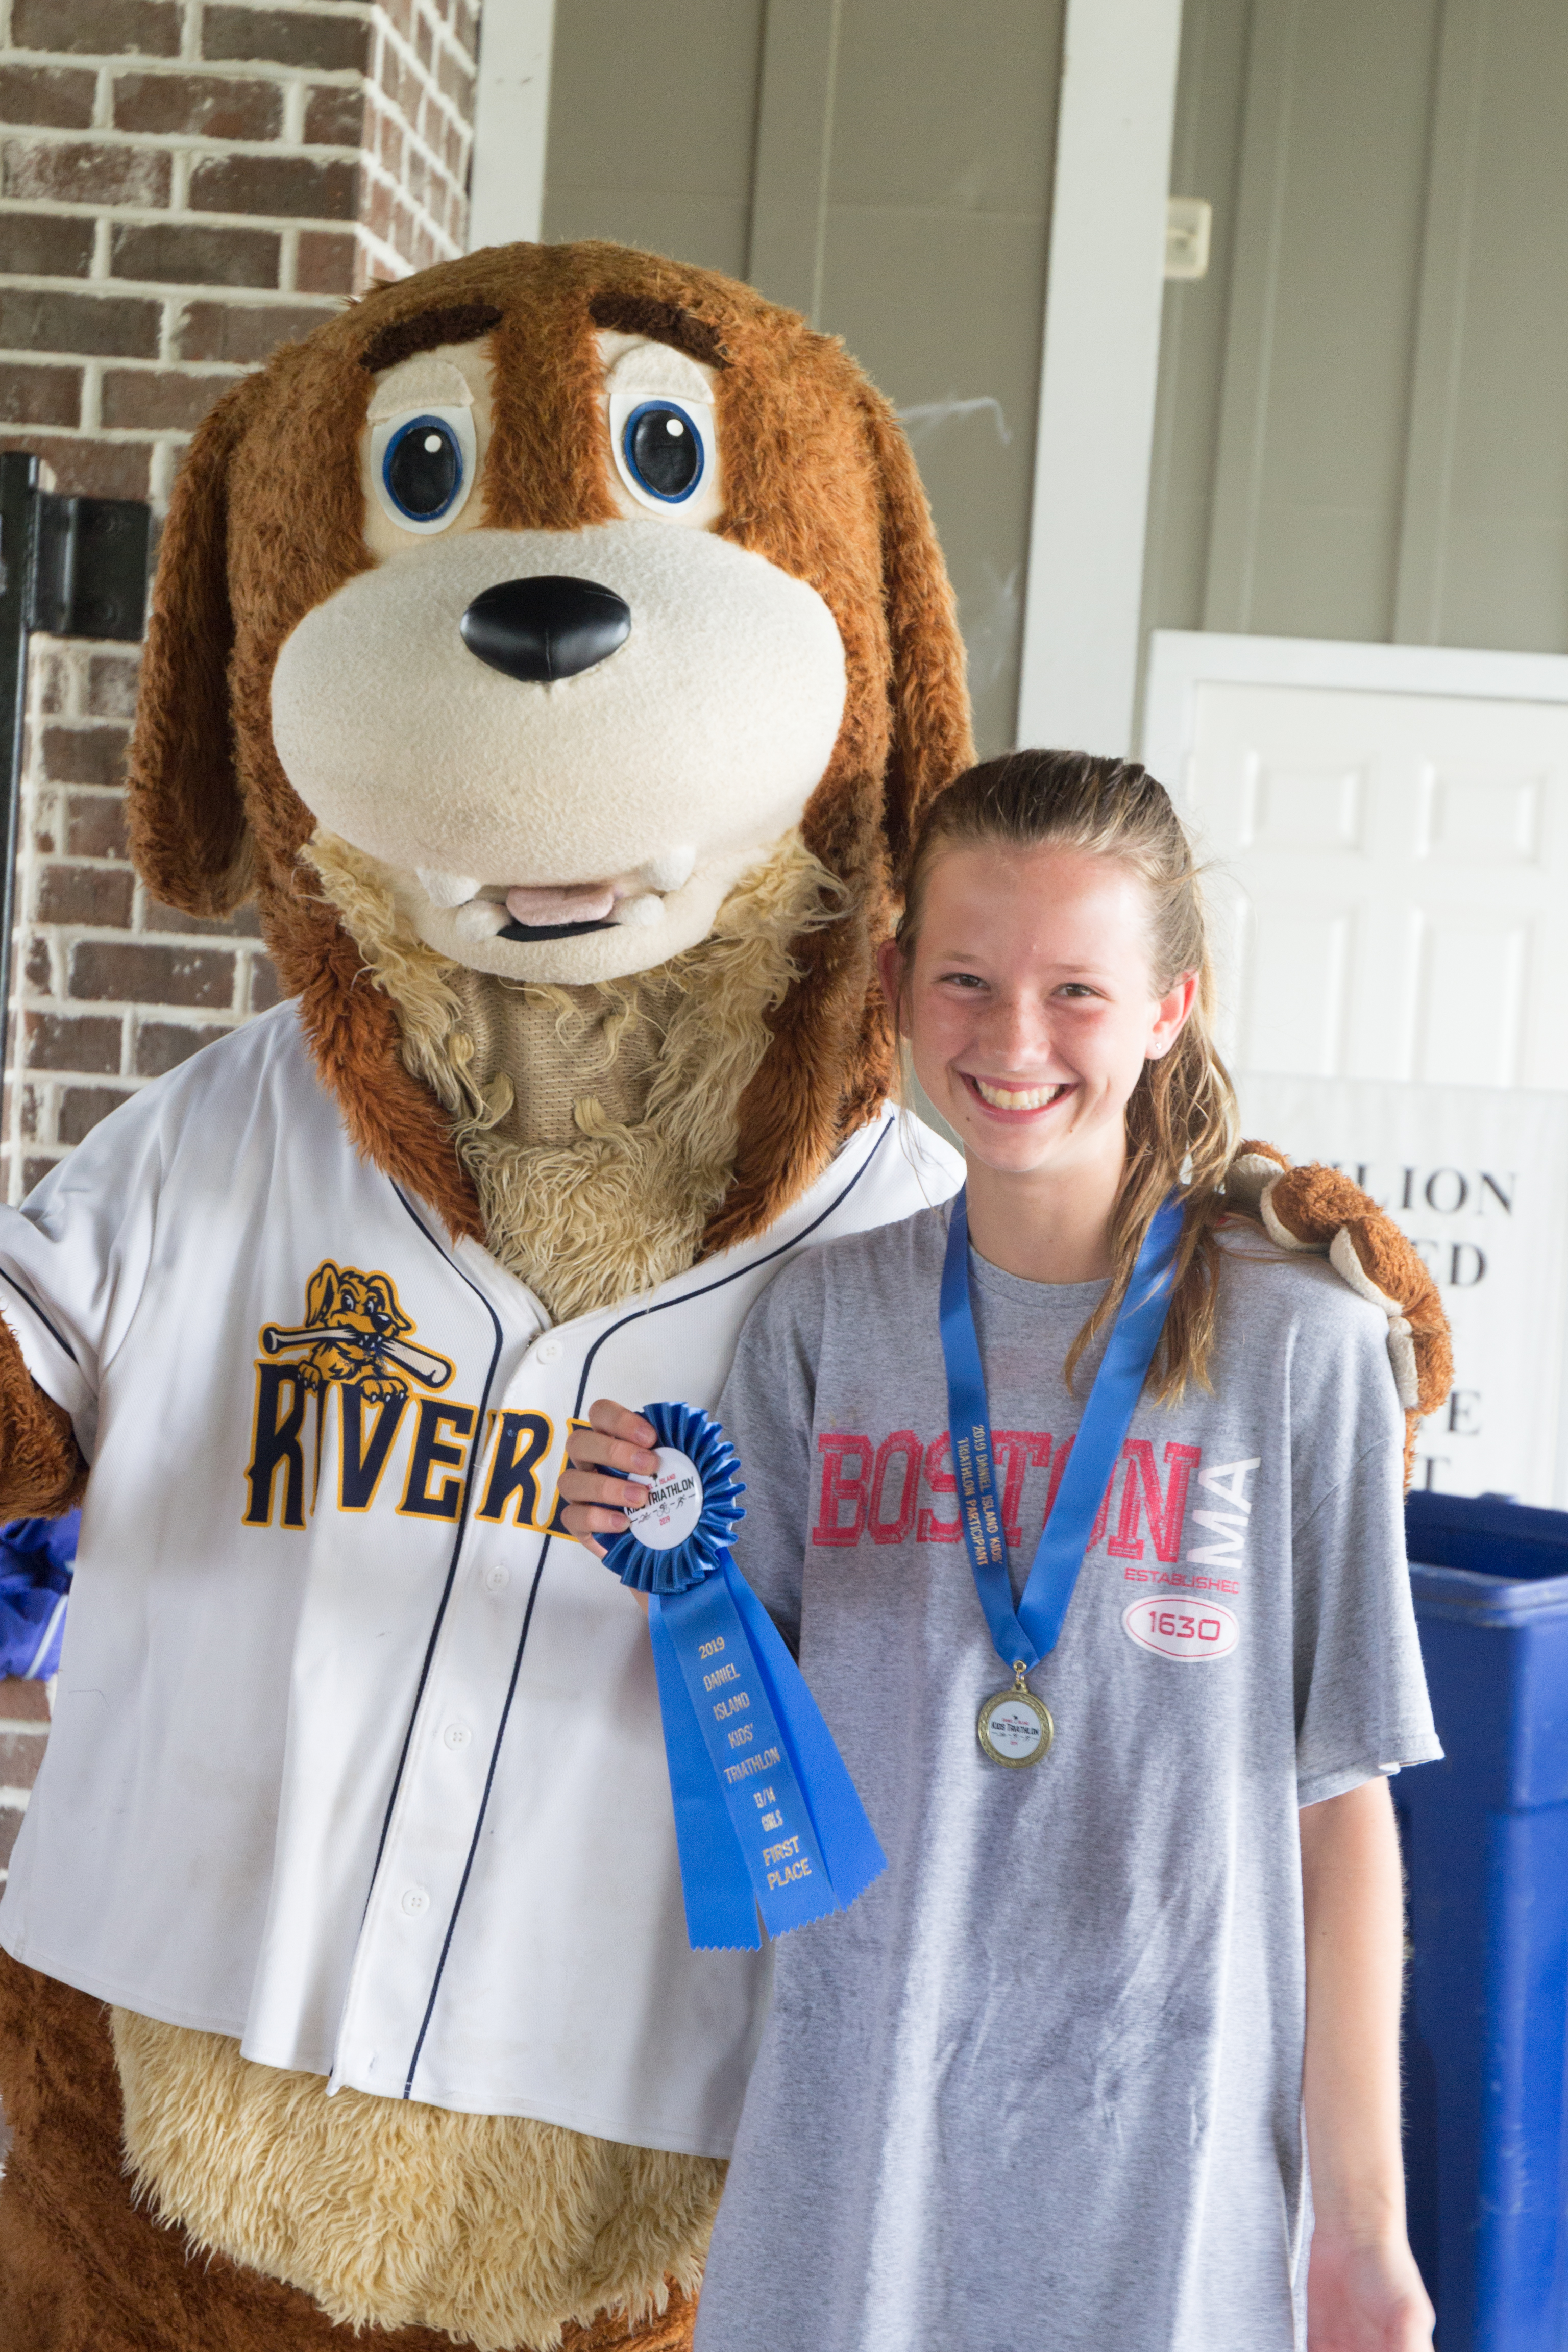 Winner in the 13-14 year old girls' category (200 meter swim, 5.5 mile bike, 1 mile run): Josephine May (1st).